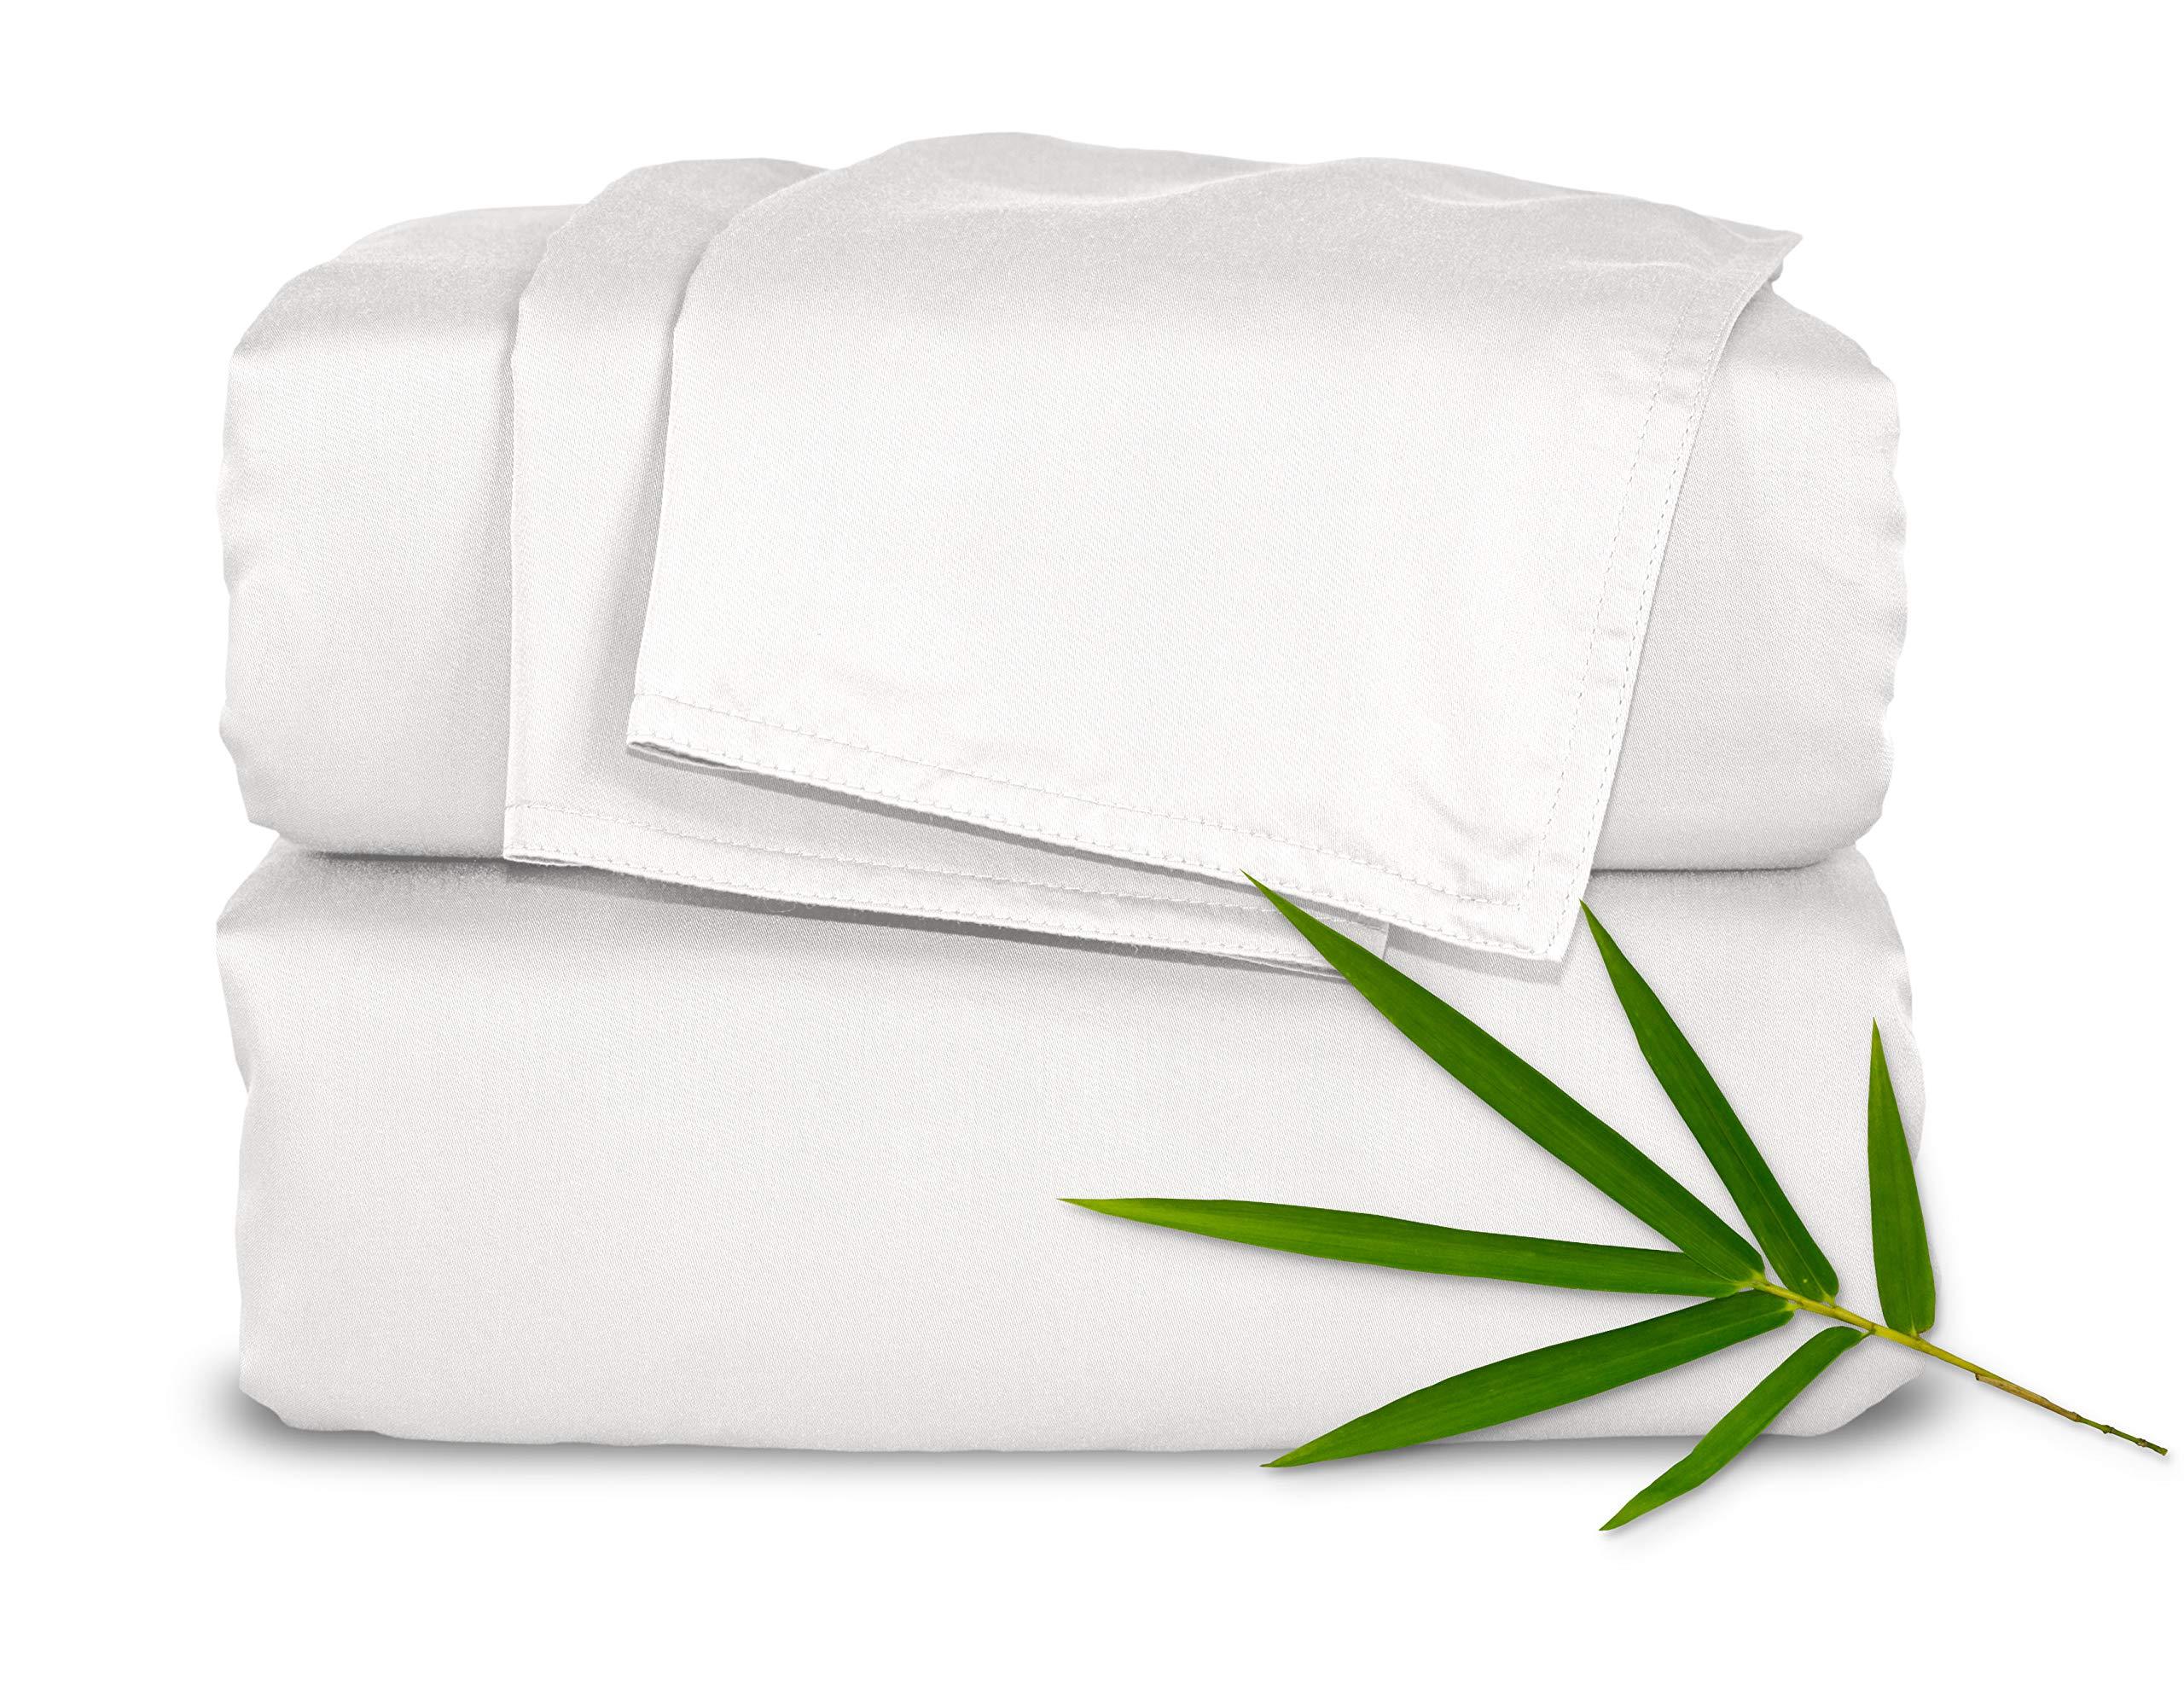 Pure Bamboo 100% Organic Bamboo Sheet Set - 4pc